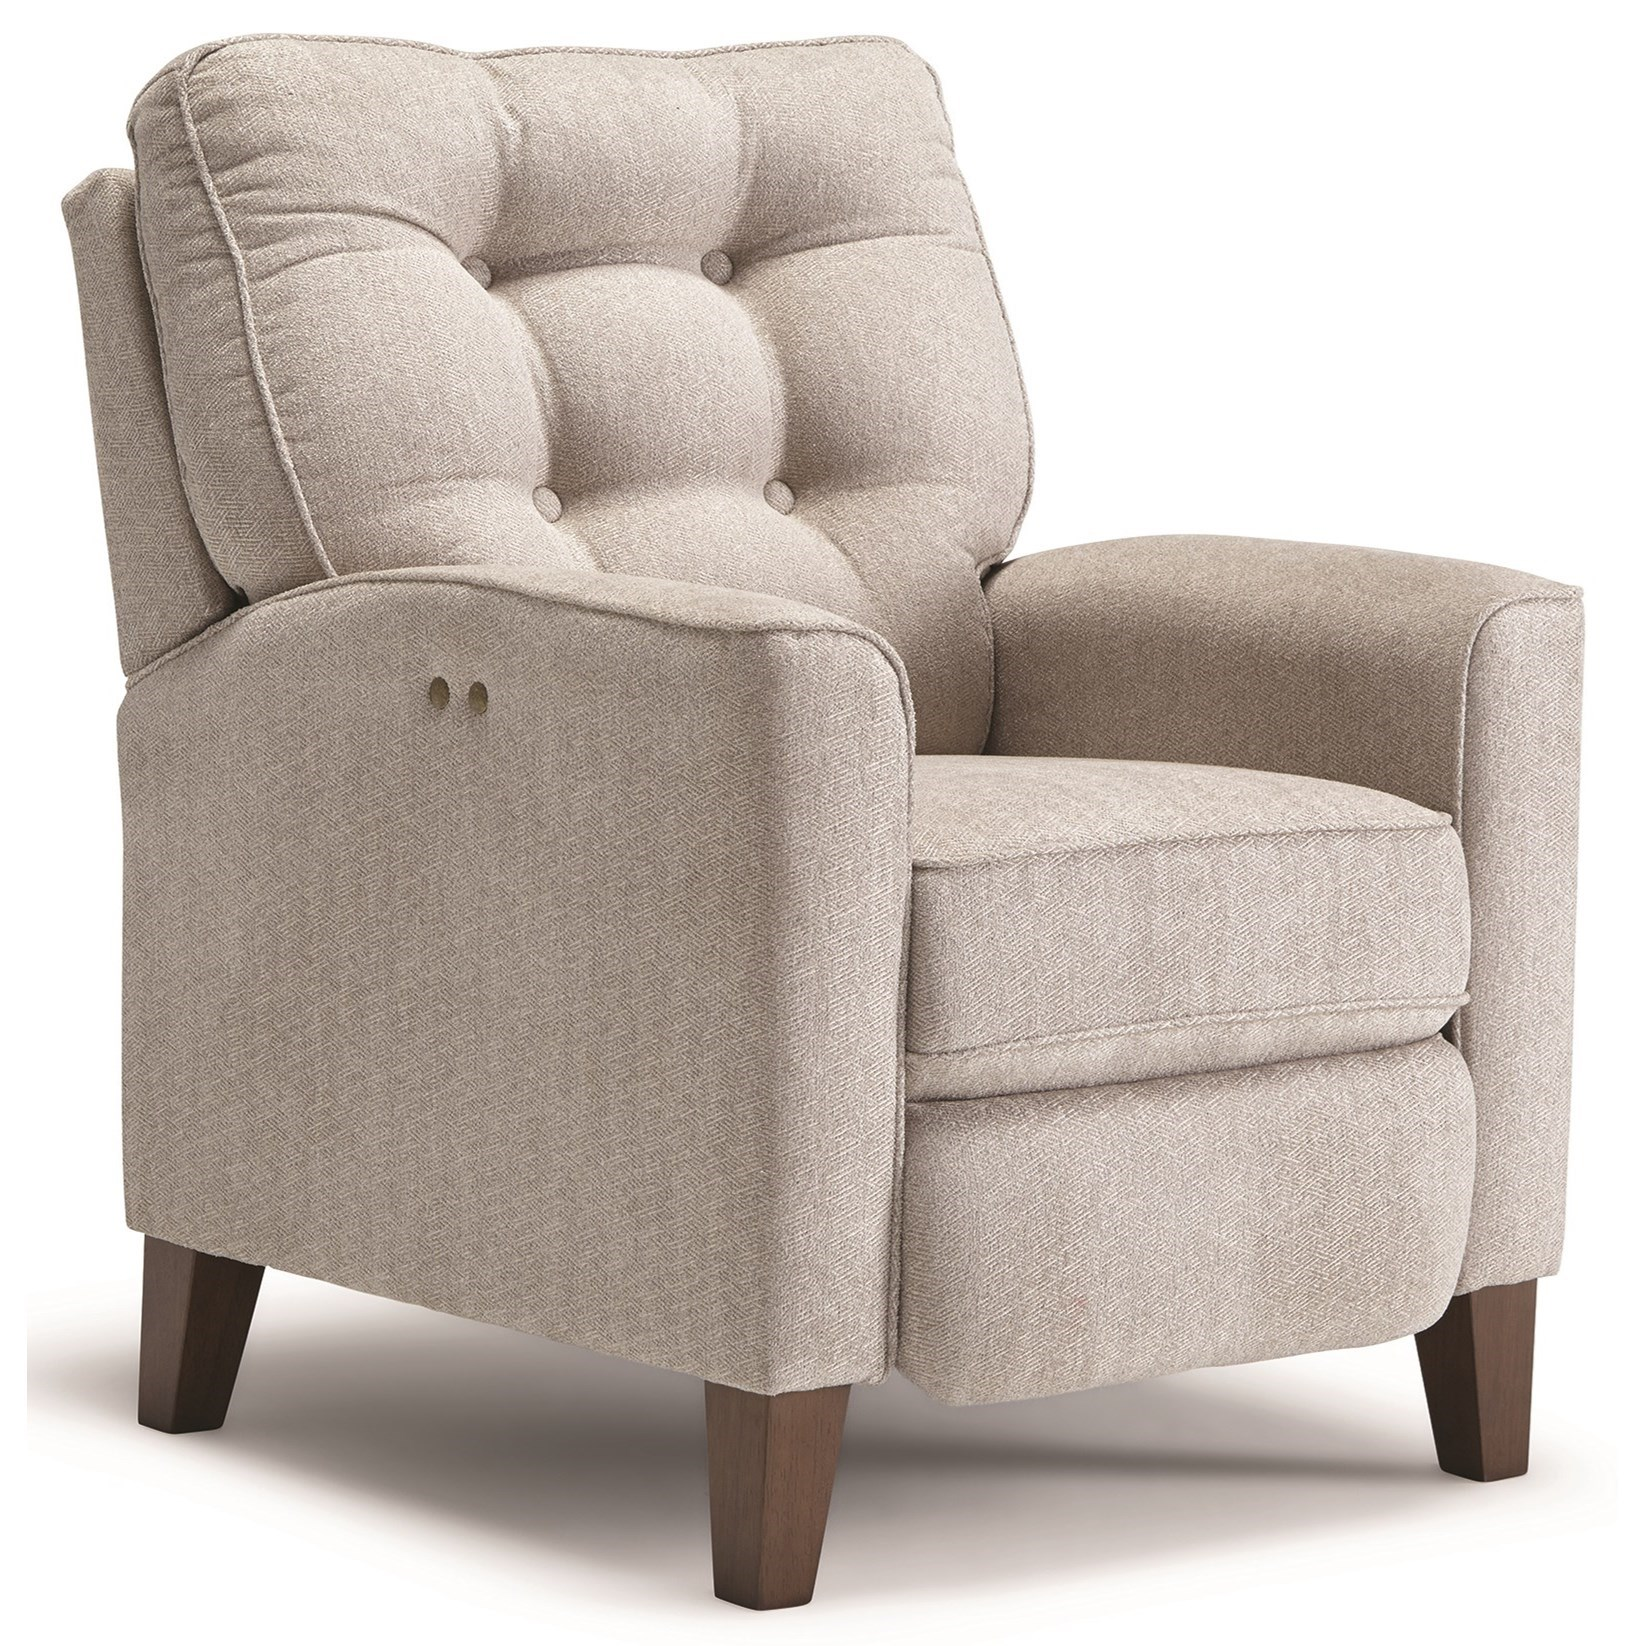 Best Home Furnishings Karinta 3lp70 Power High Leg